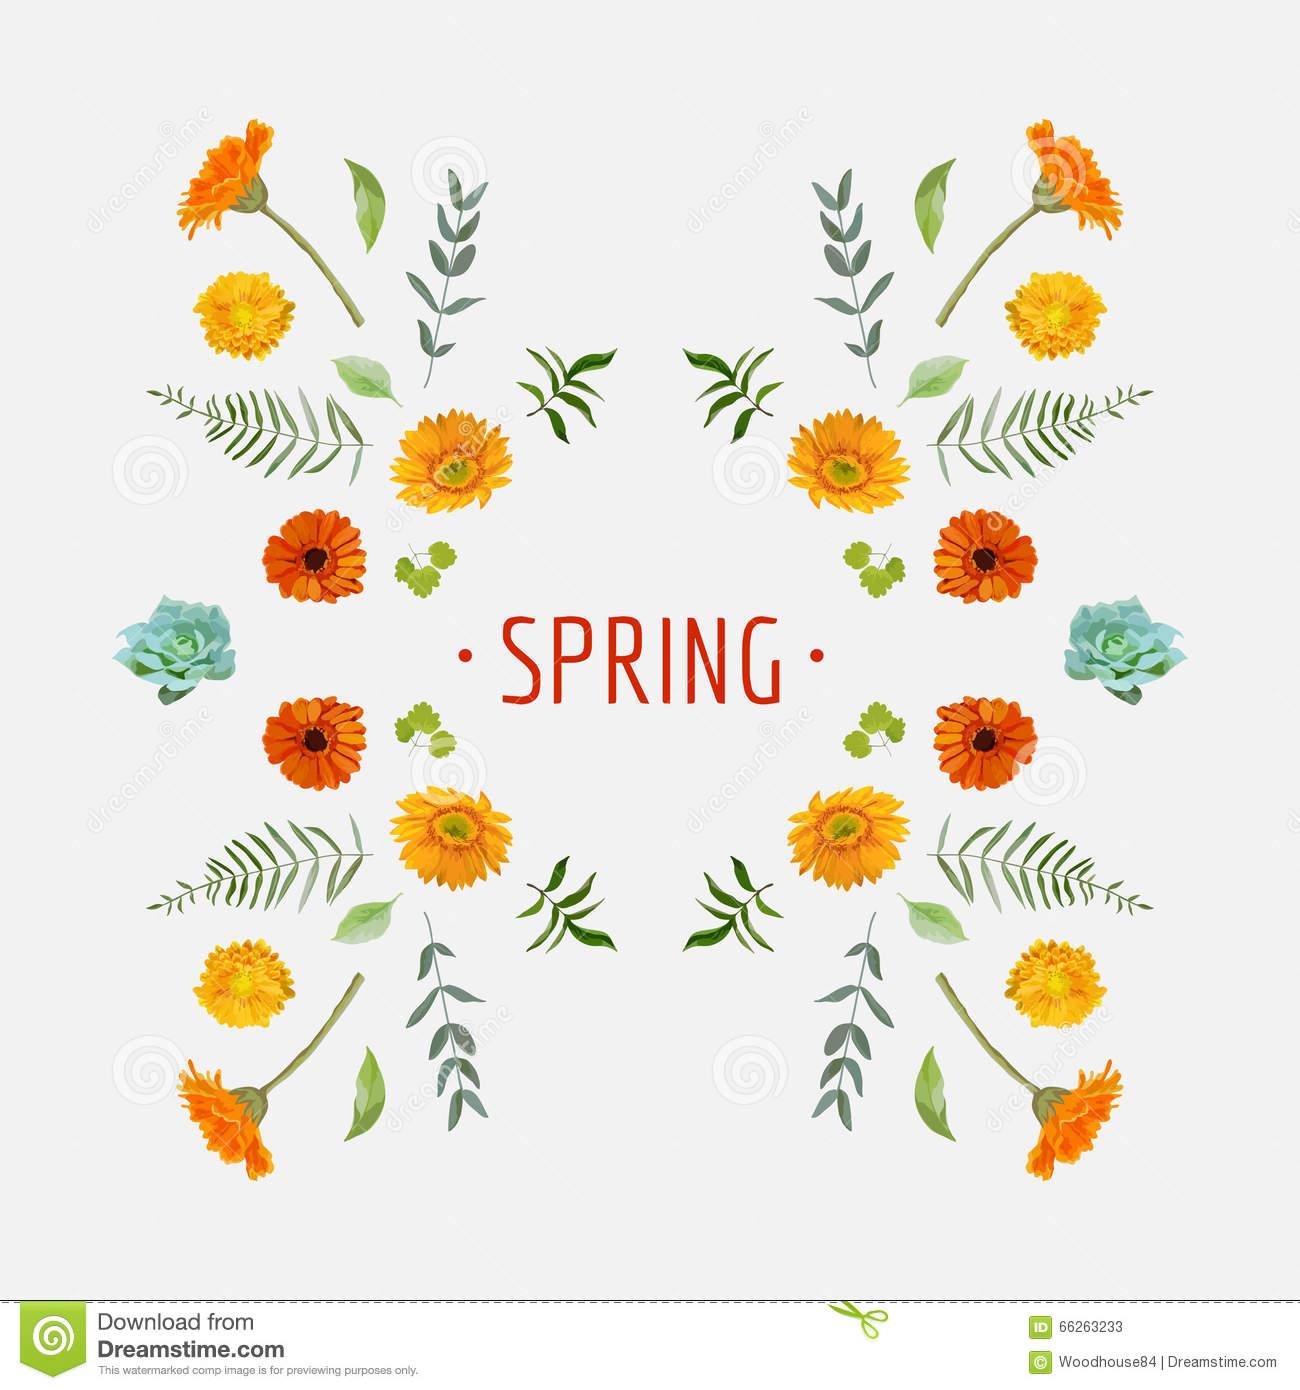 Floral graphic designs clip black and white download Spring - Floral Graphic Design Stock Vector - Image: 66263232 clip black and white download